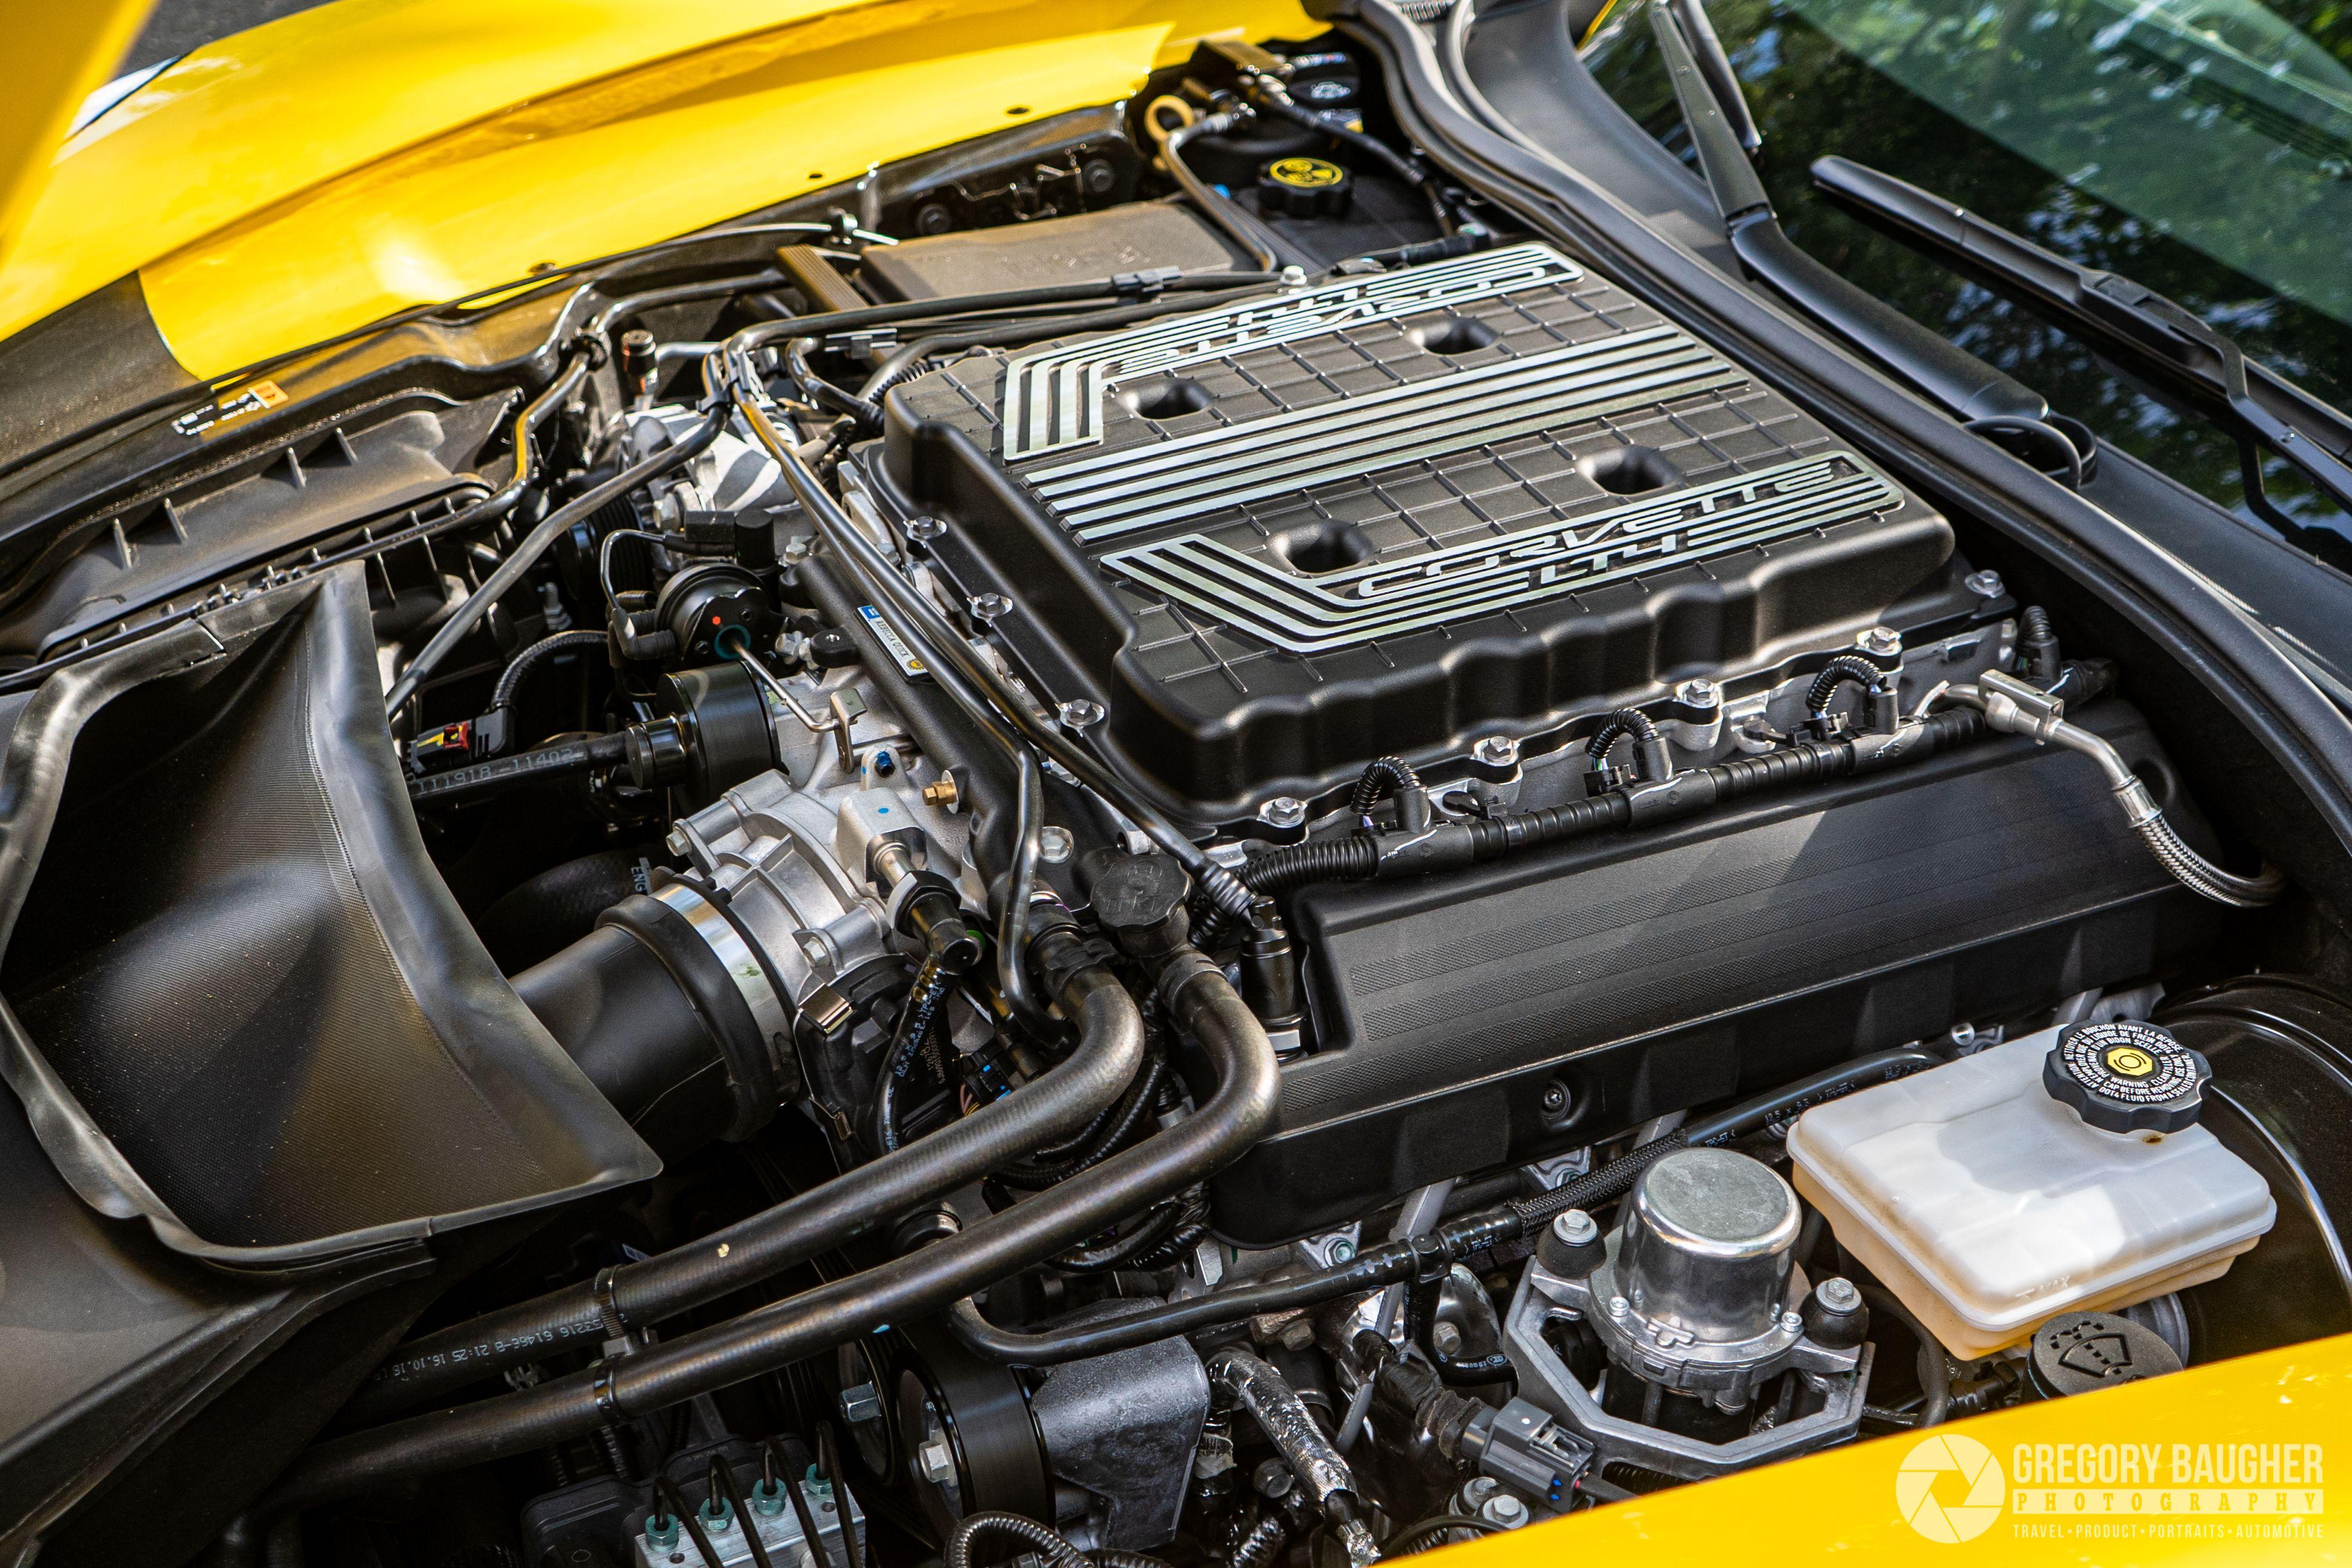 The 2019 Chevrolet Corvette Z06 Chevrolet Corvette Z06 Corvette